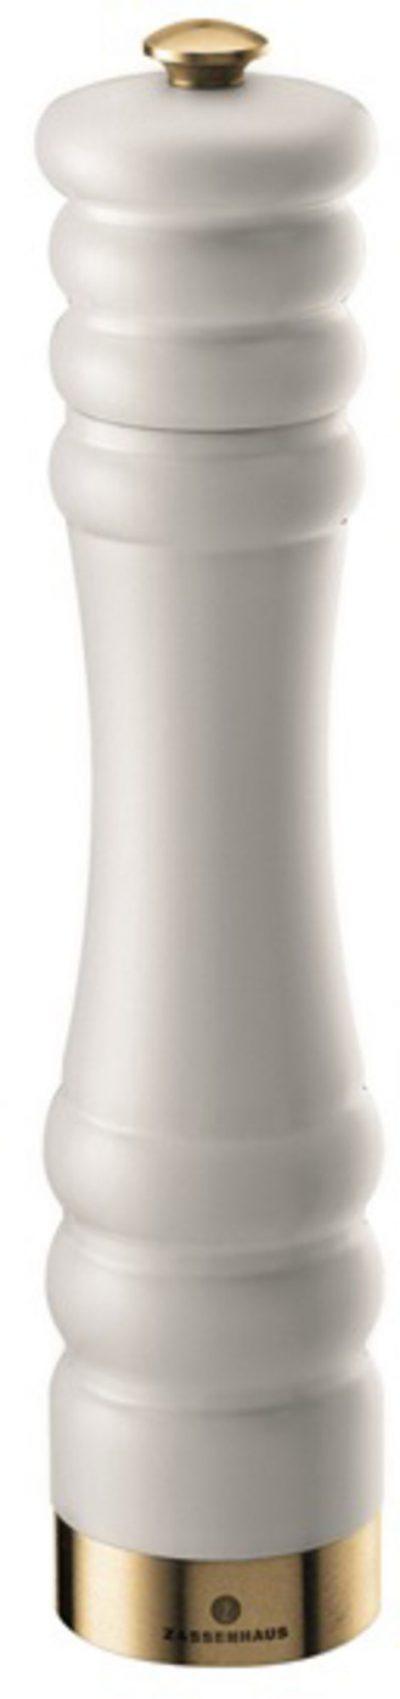 Zassenhaus Saltkvarn Munchen Matt Vit/Guld 25 cm 150 År